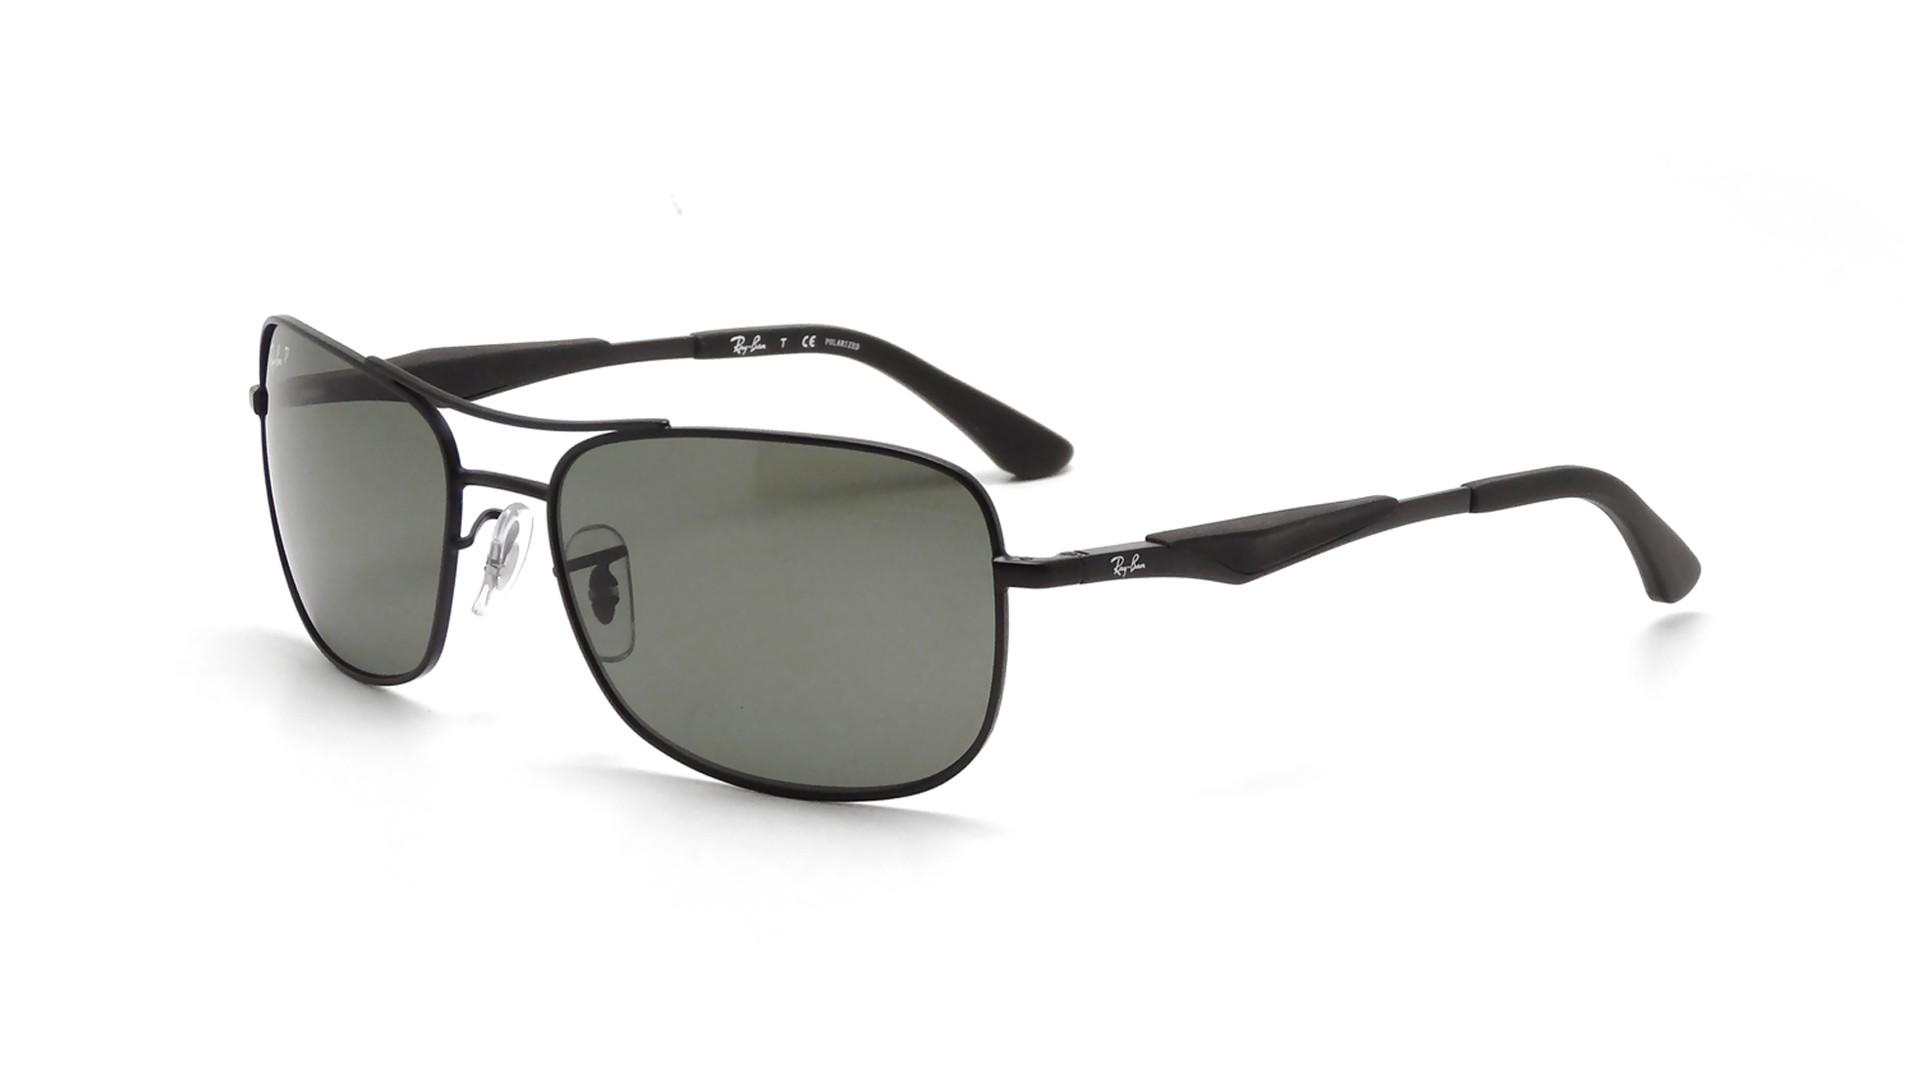 ba2c1cedba Sunglasses Ray-Ban RB3515 006 9A 58-17 Black Large Polarized